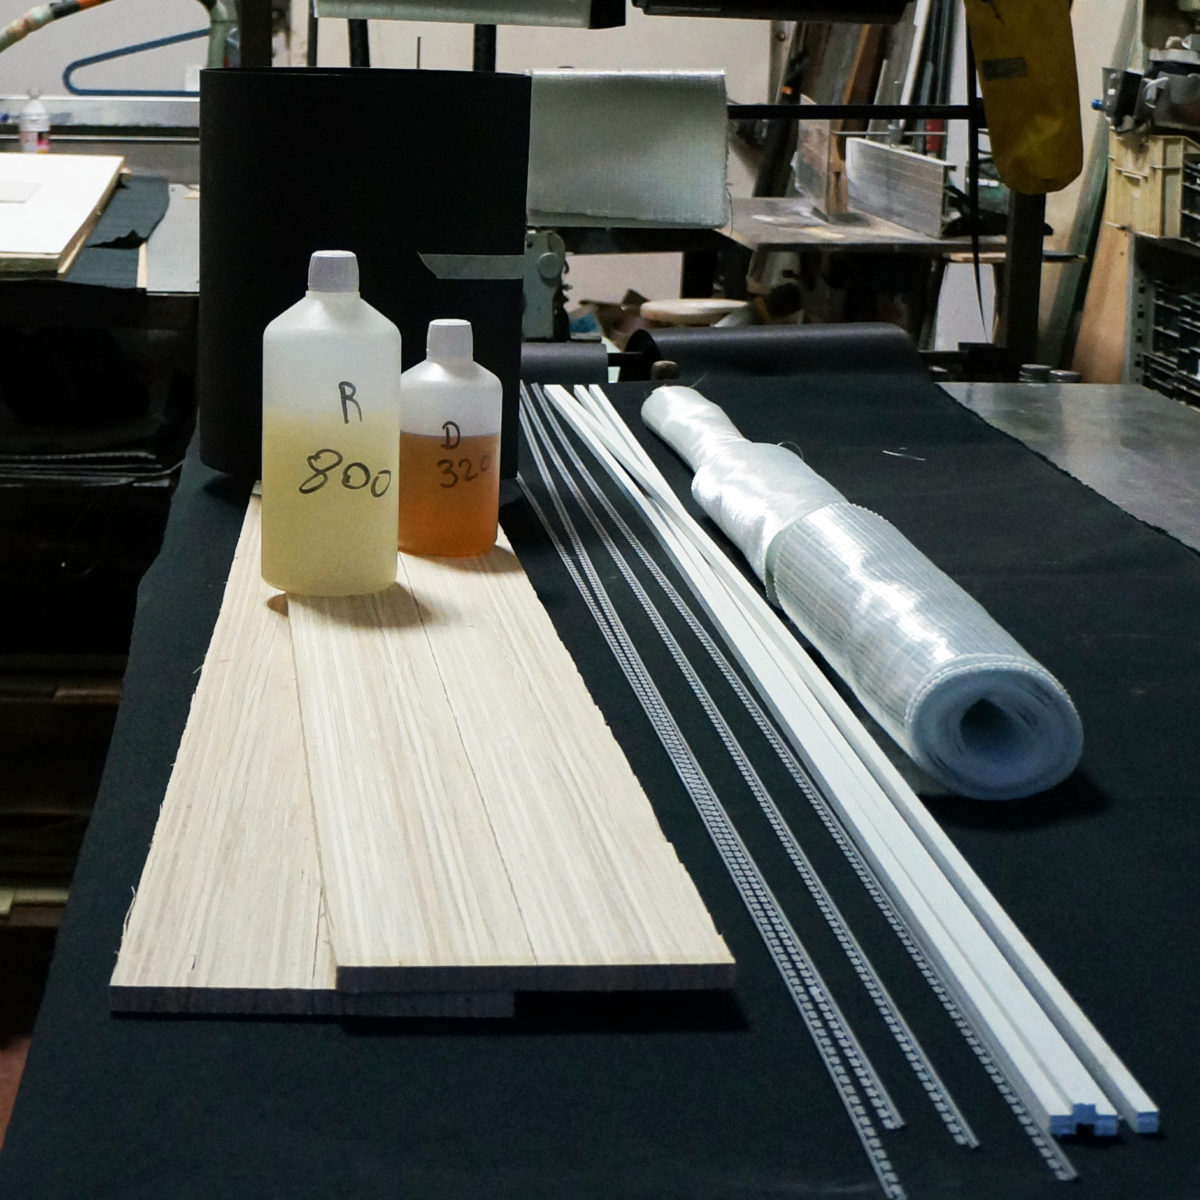 Kit DIY pour fabriquer ses skis noyau bamboo